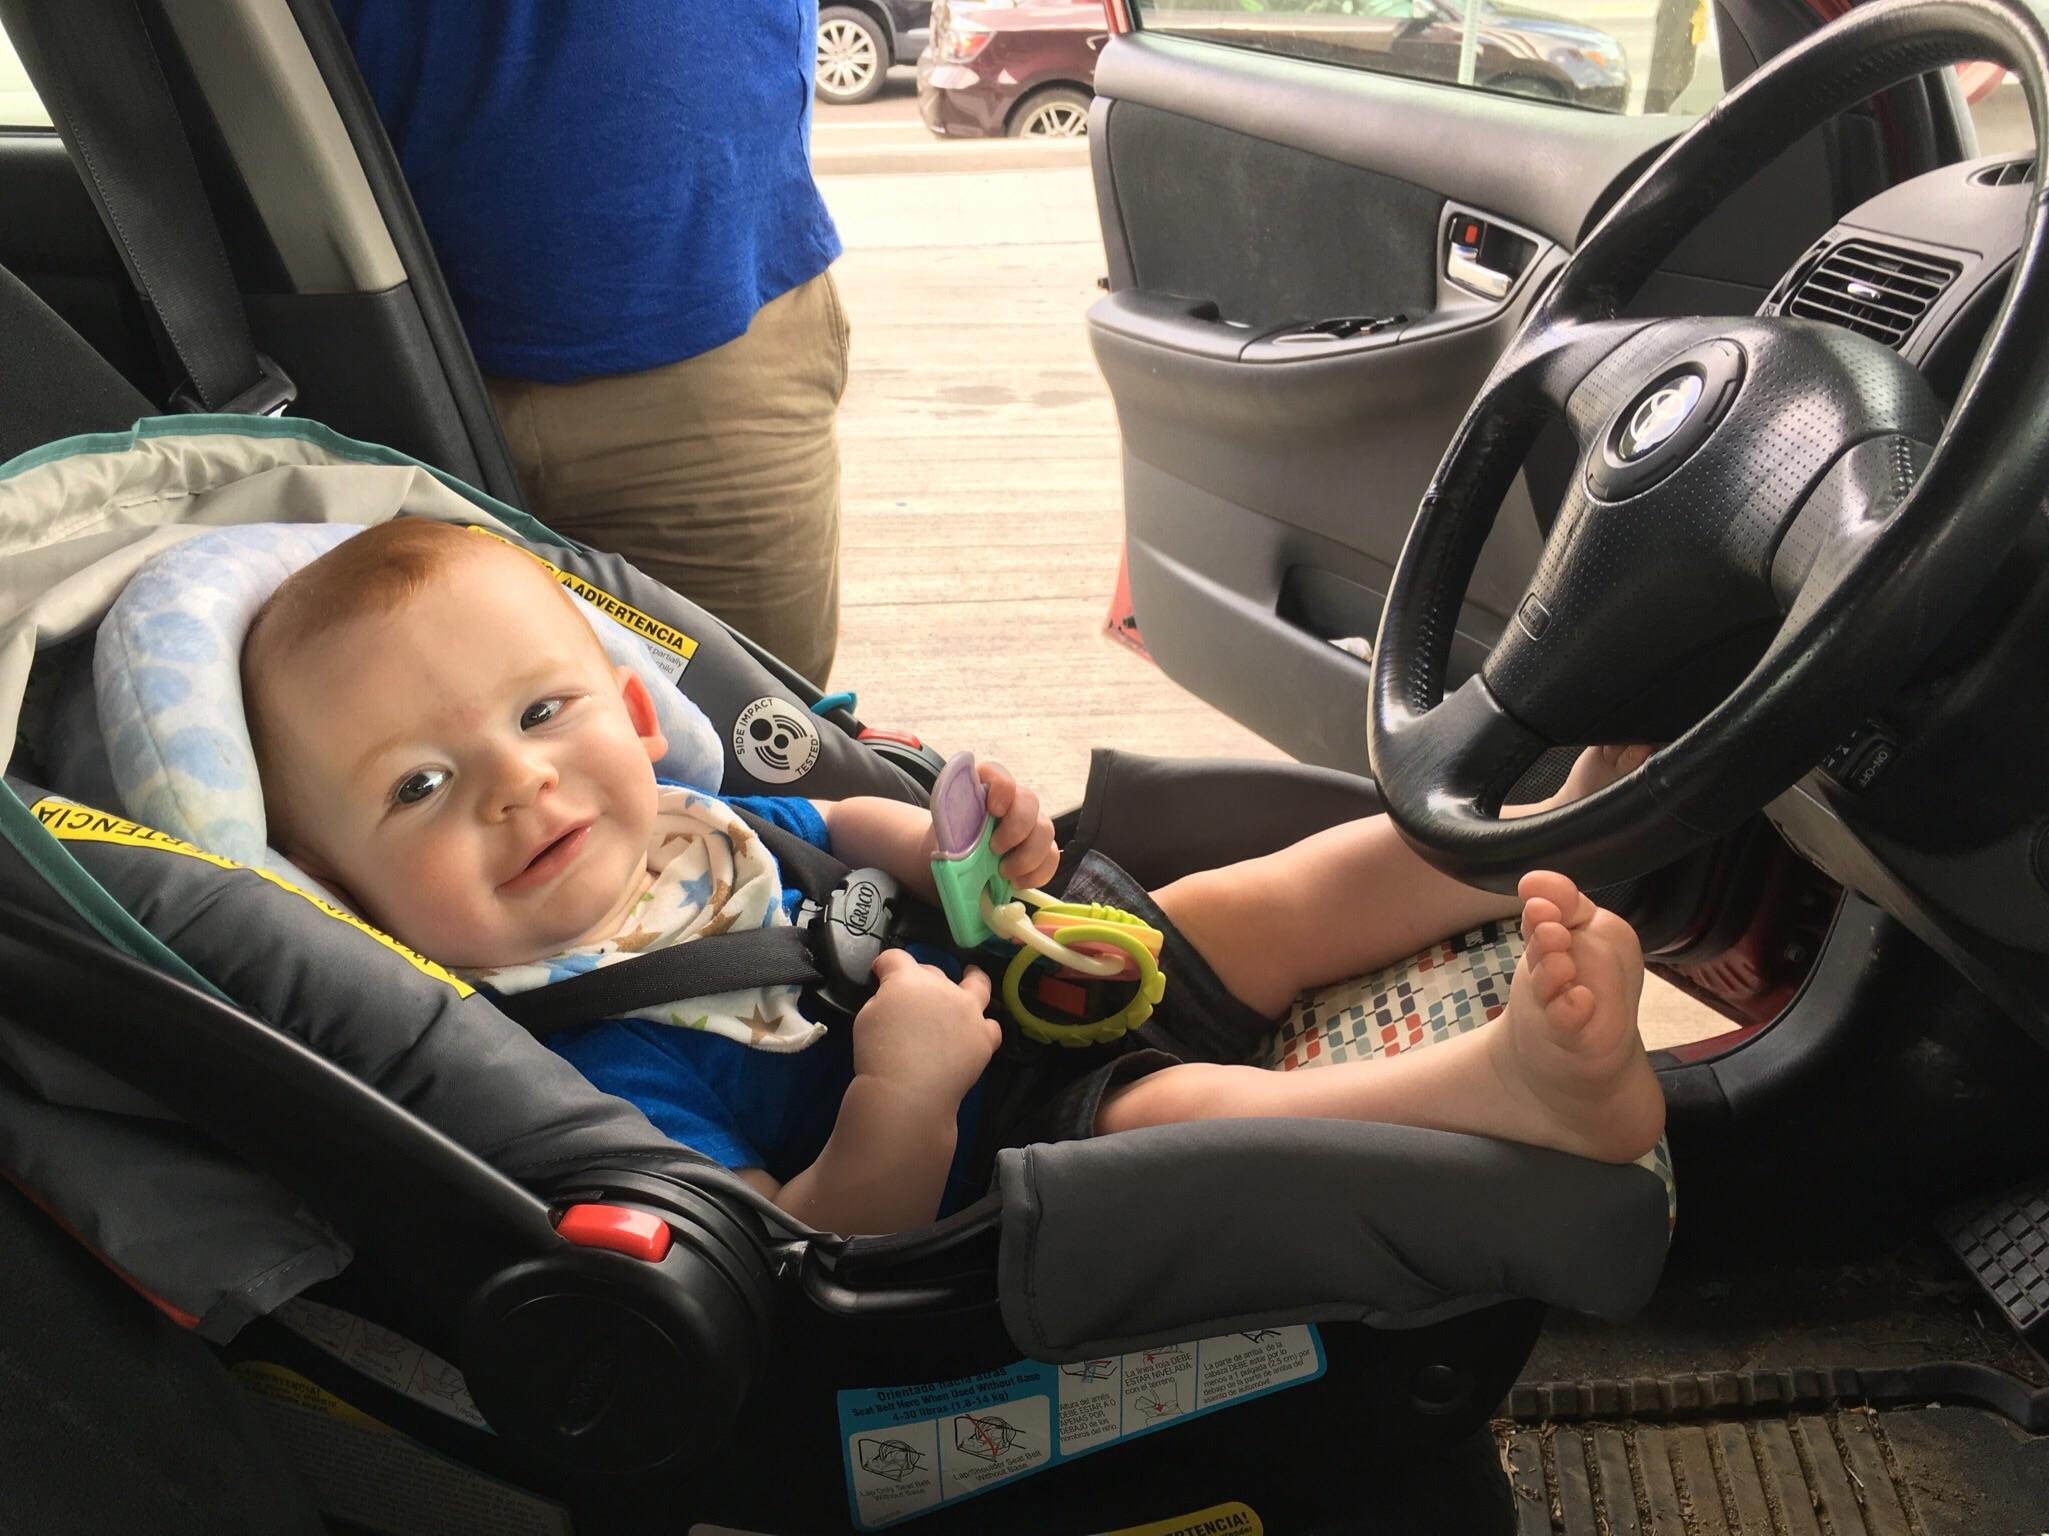 Joshua has keys and is ready to drive!